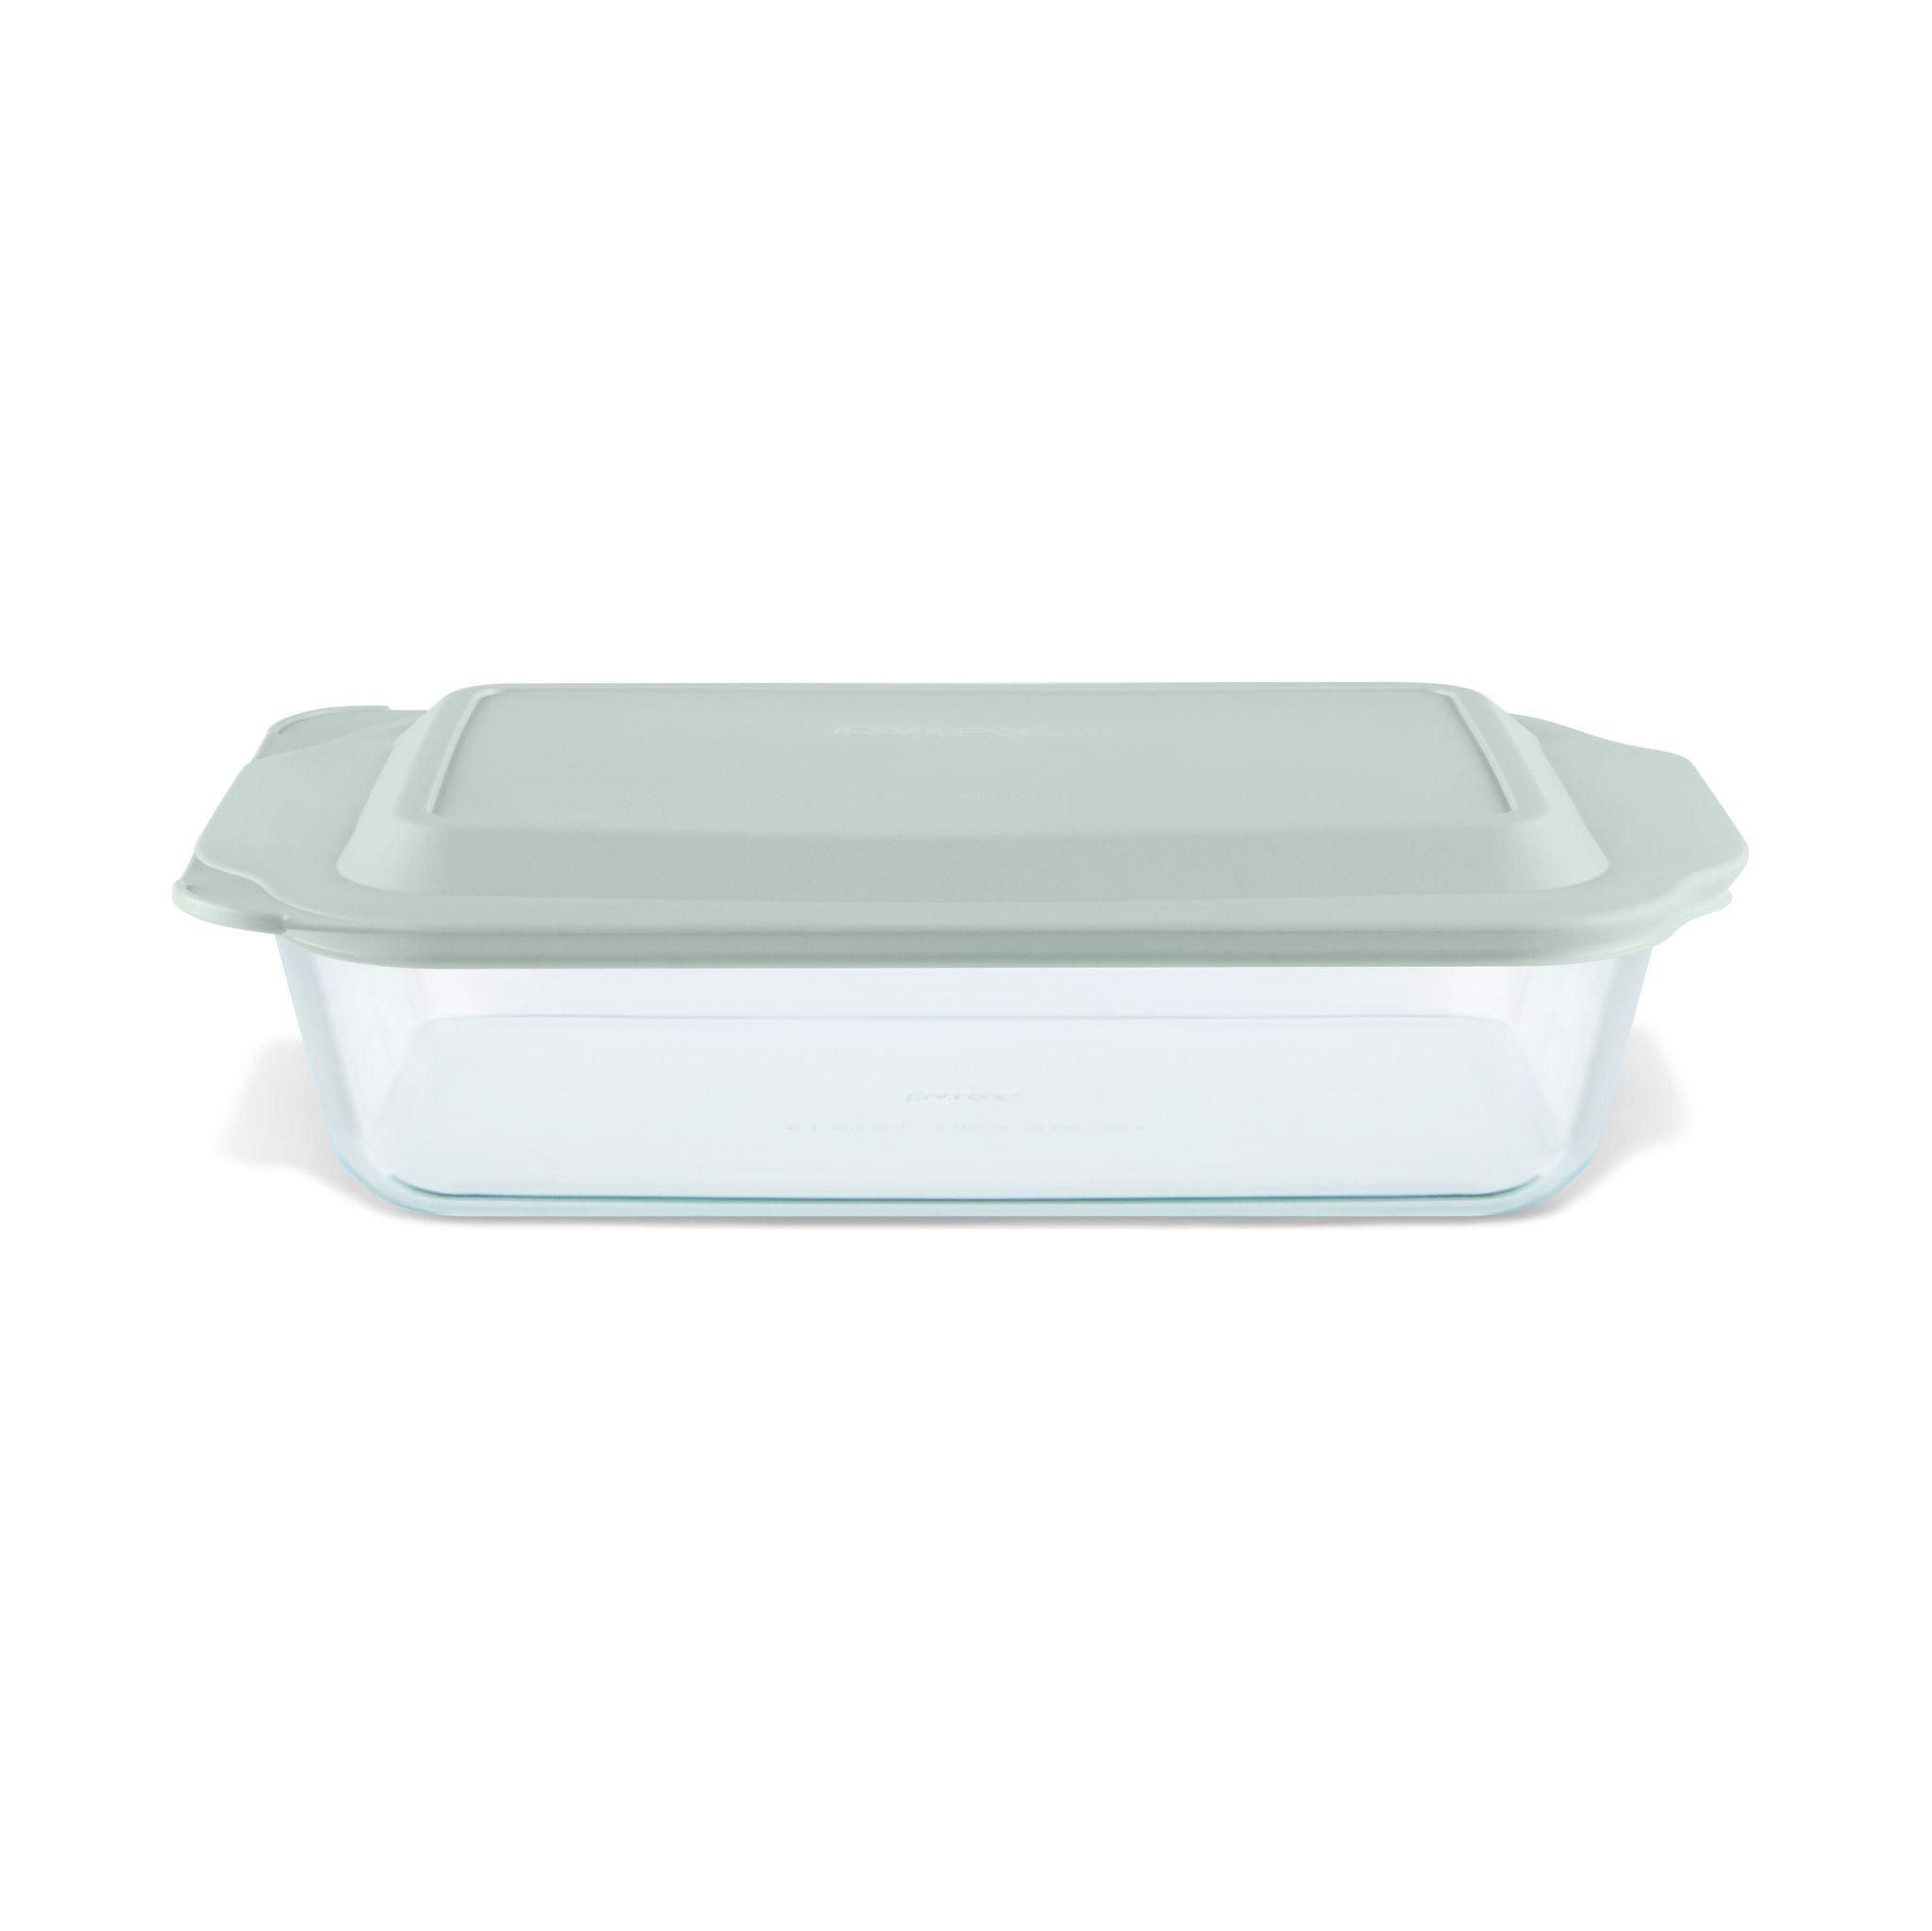 Nordic Ware Prism 9x13 Rectangular Baking Pan Nordicware 46670